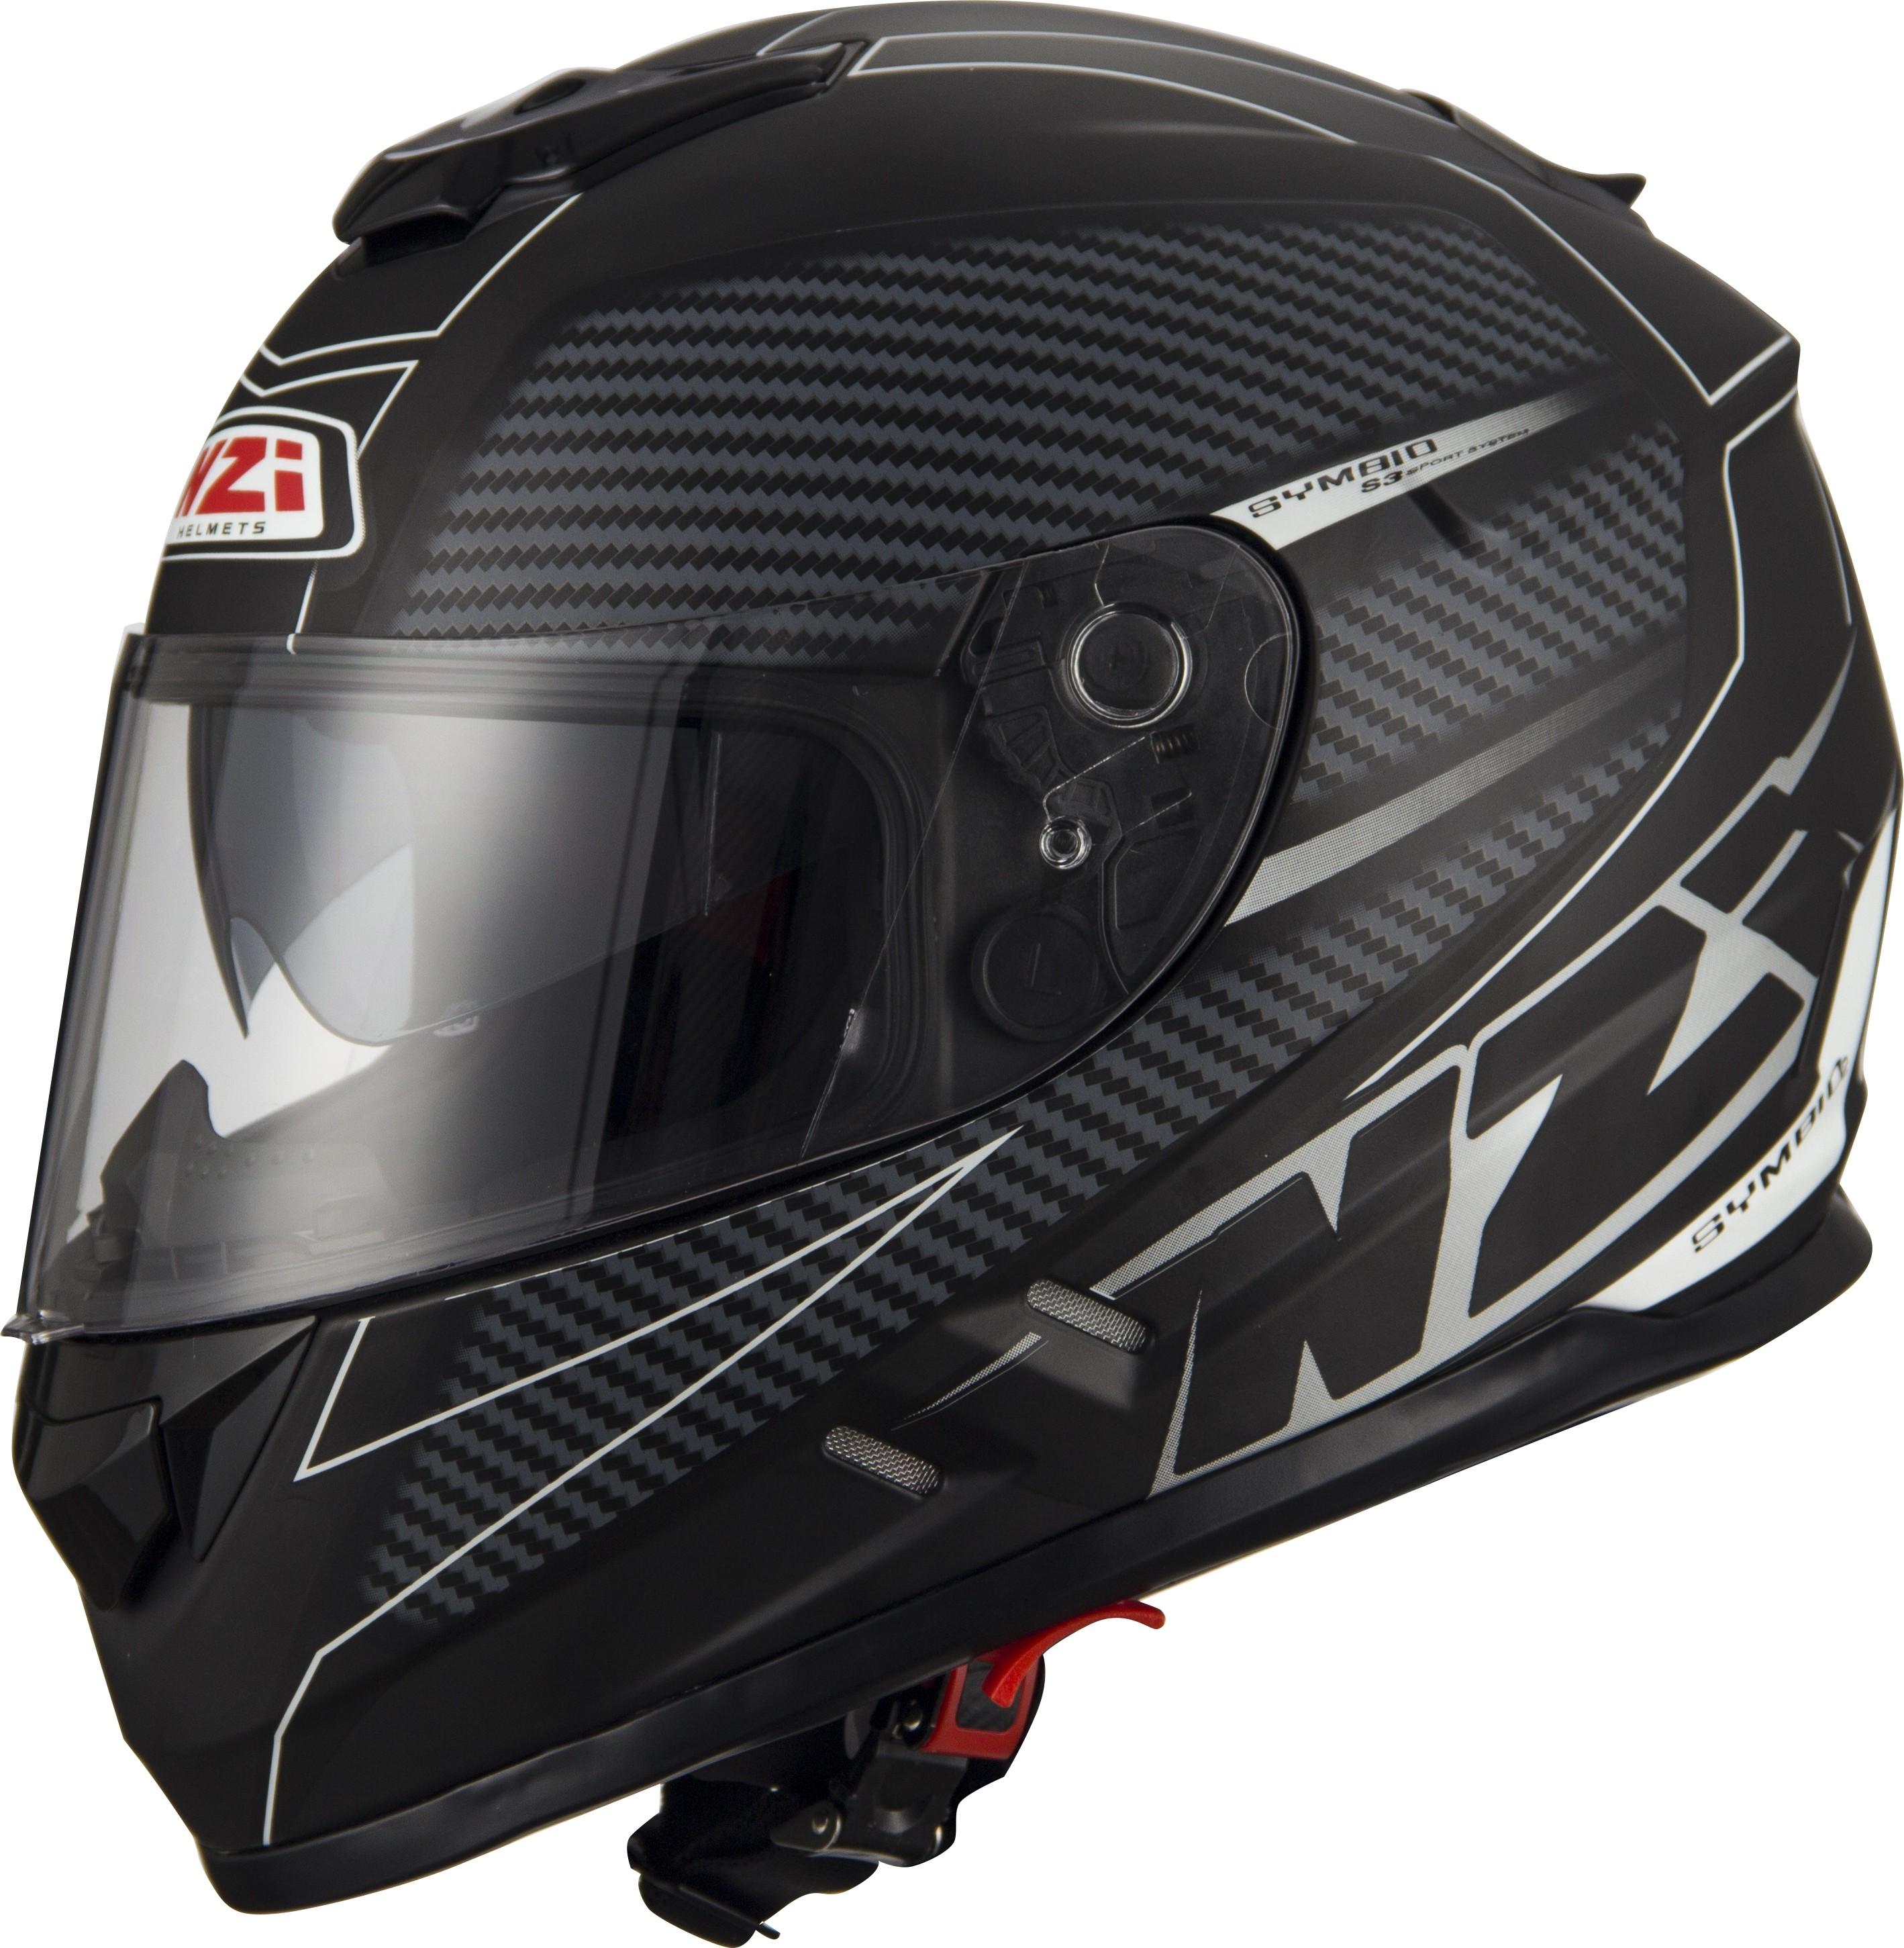 casco-nzi-symbio2-duo-visor-fiber-volt-negro-blanco-mate-150301a051